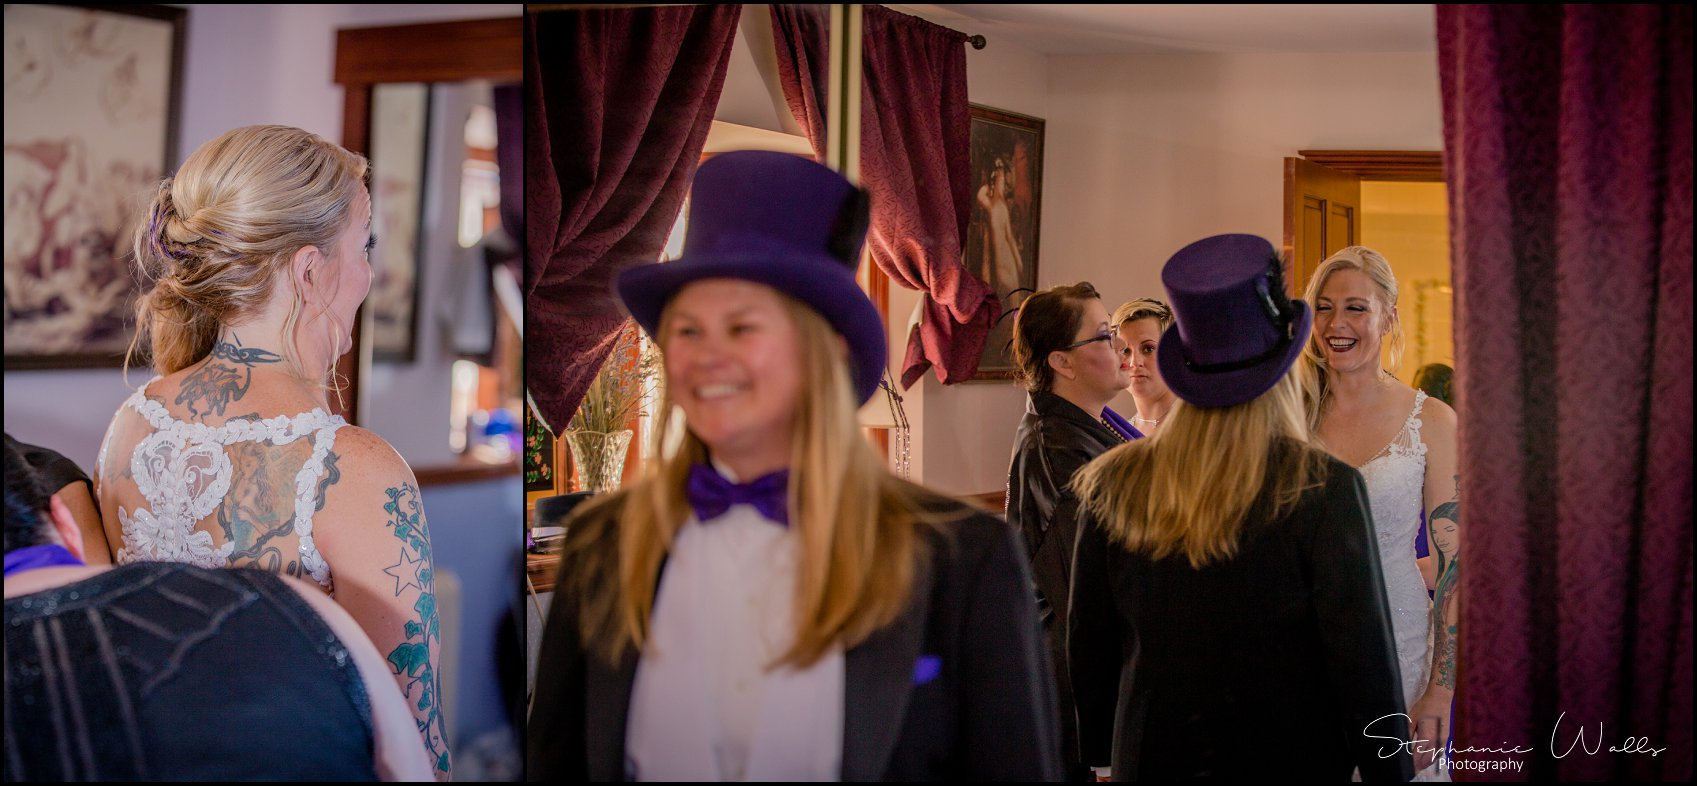 Everist Wedding 056 Patti & Bobbys | Troll Haven Castle & Bandy Farms | Sequim, Wa Wedding Photographer